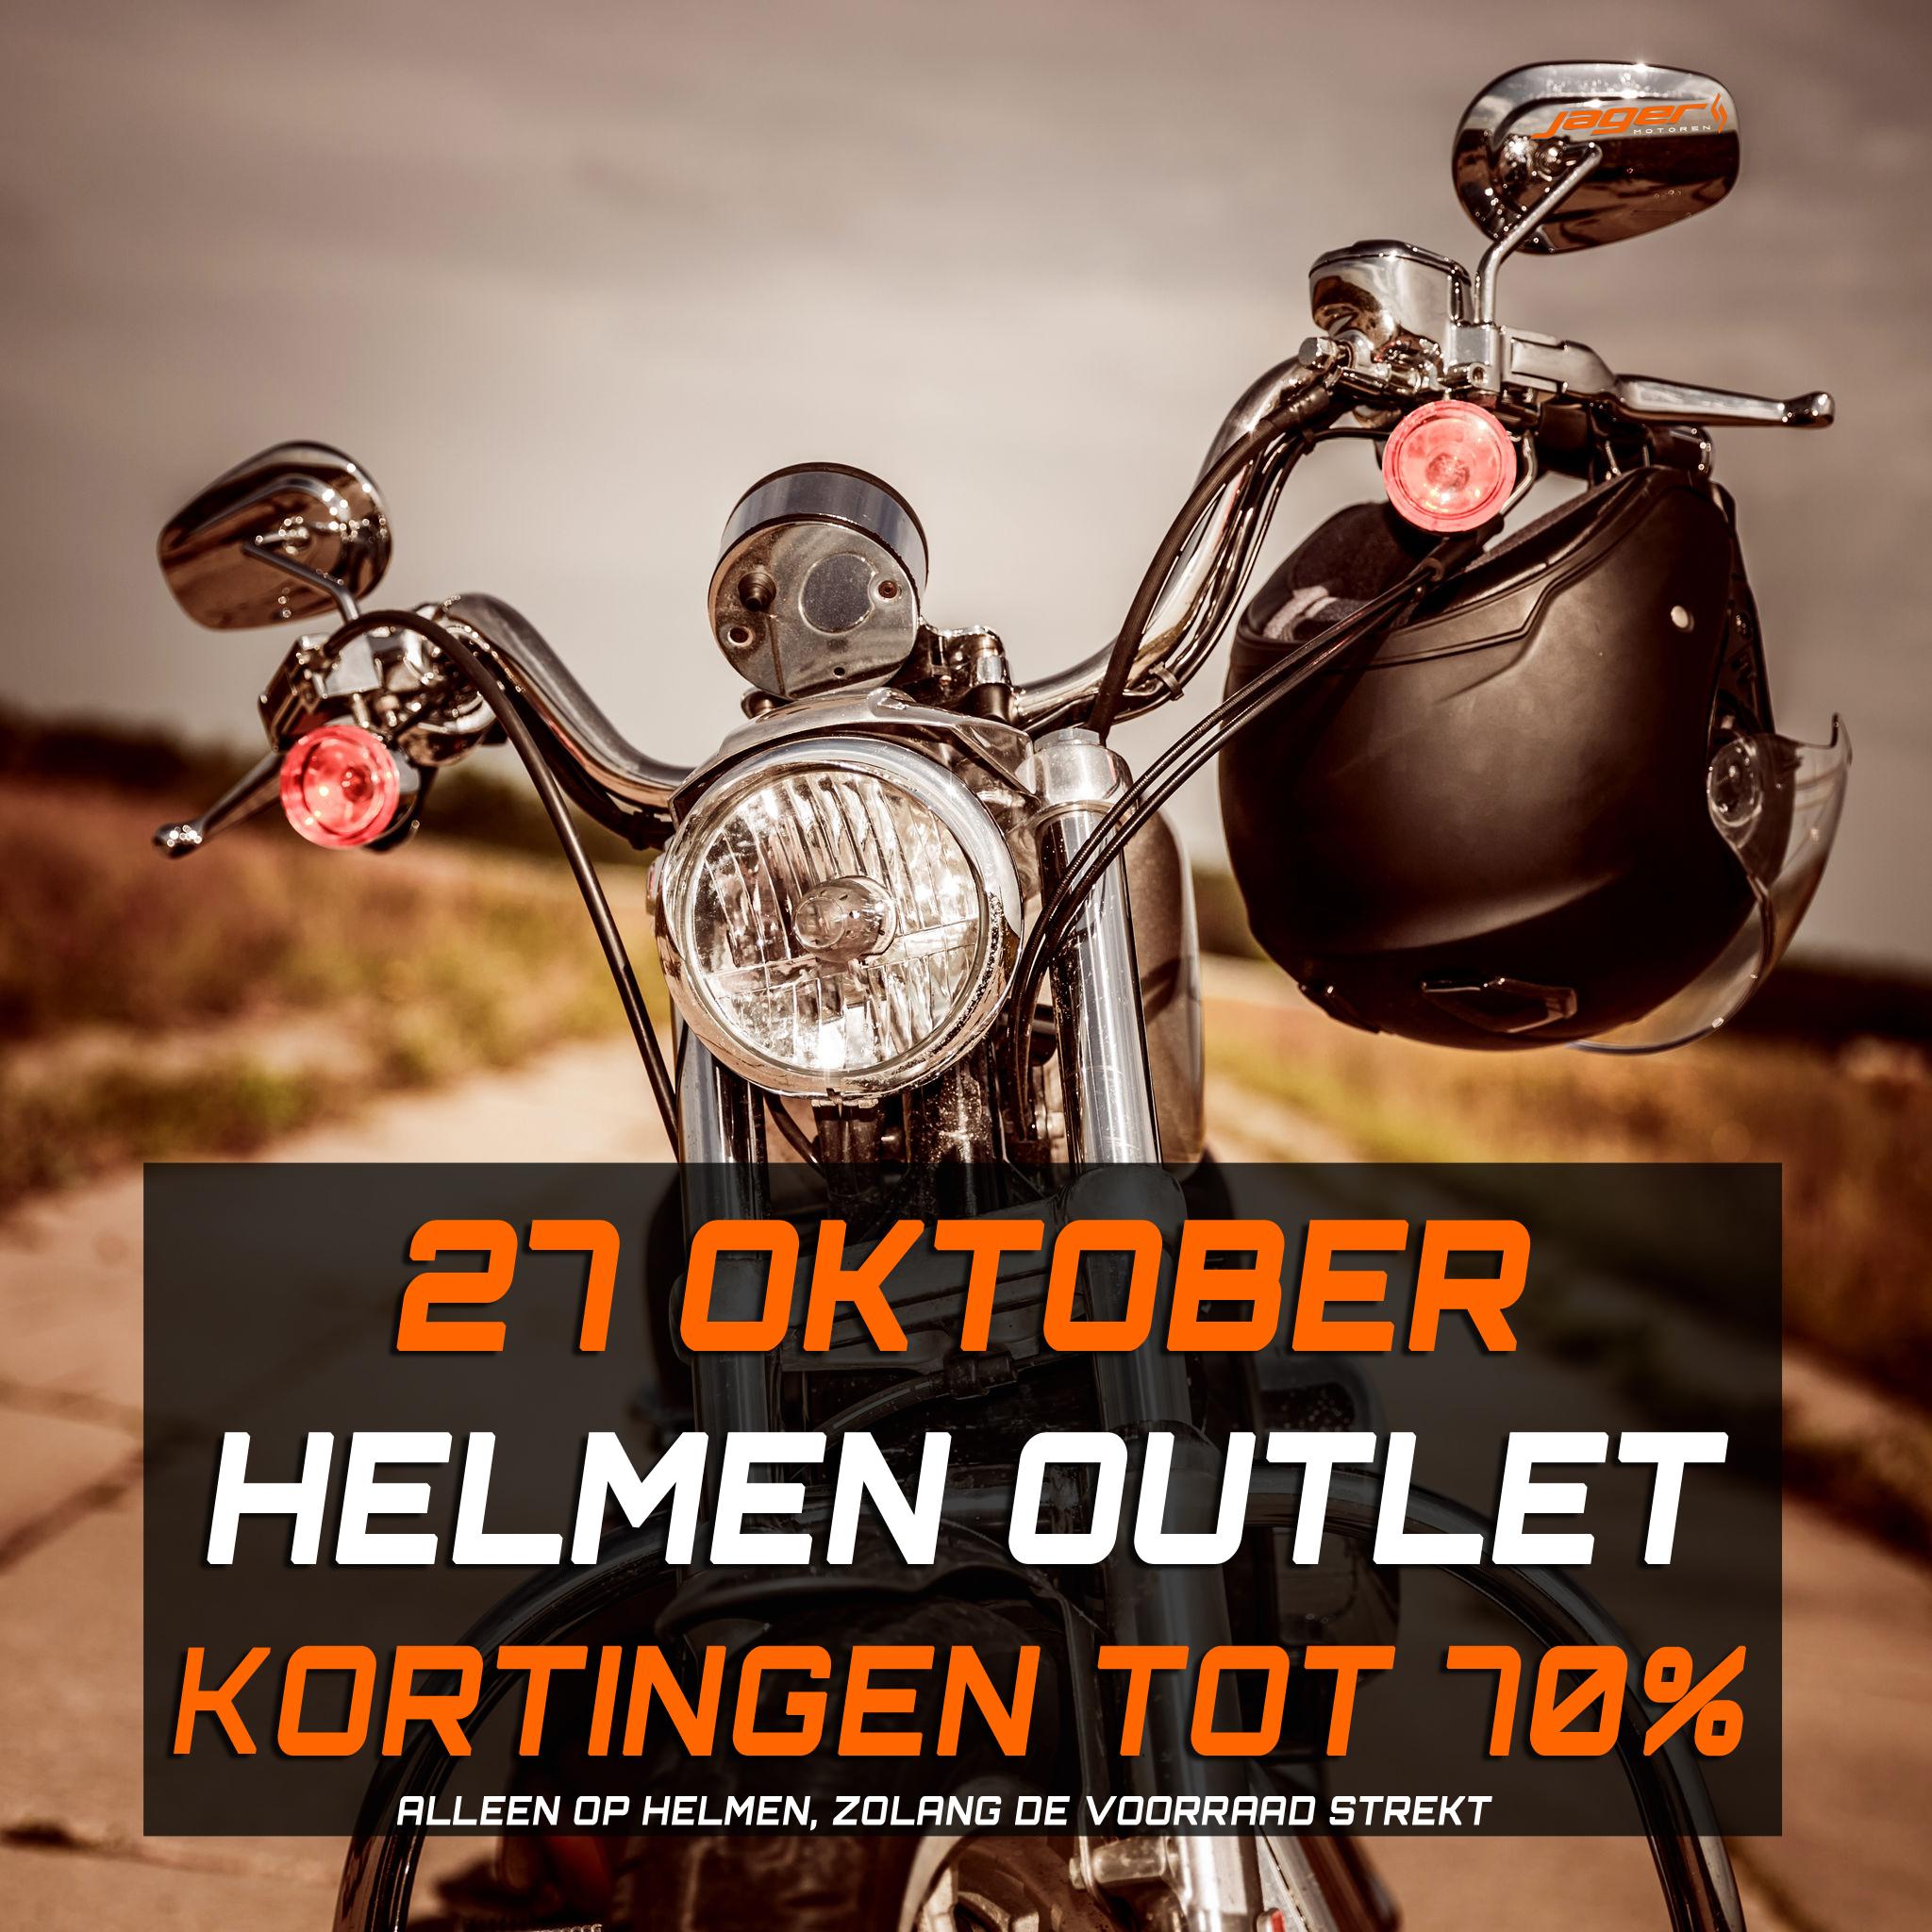 Helmen outlet